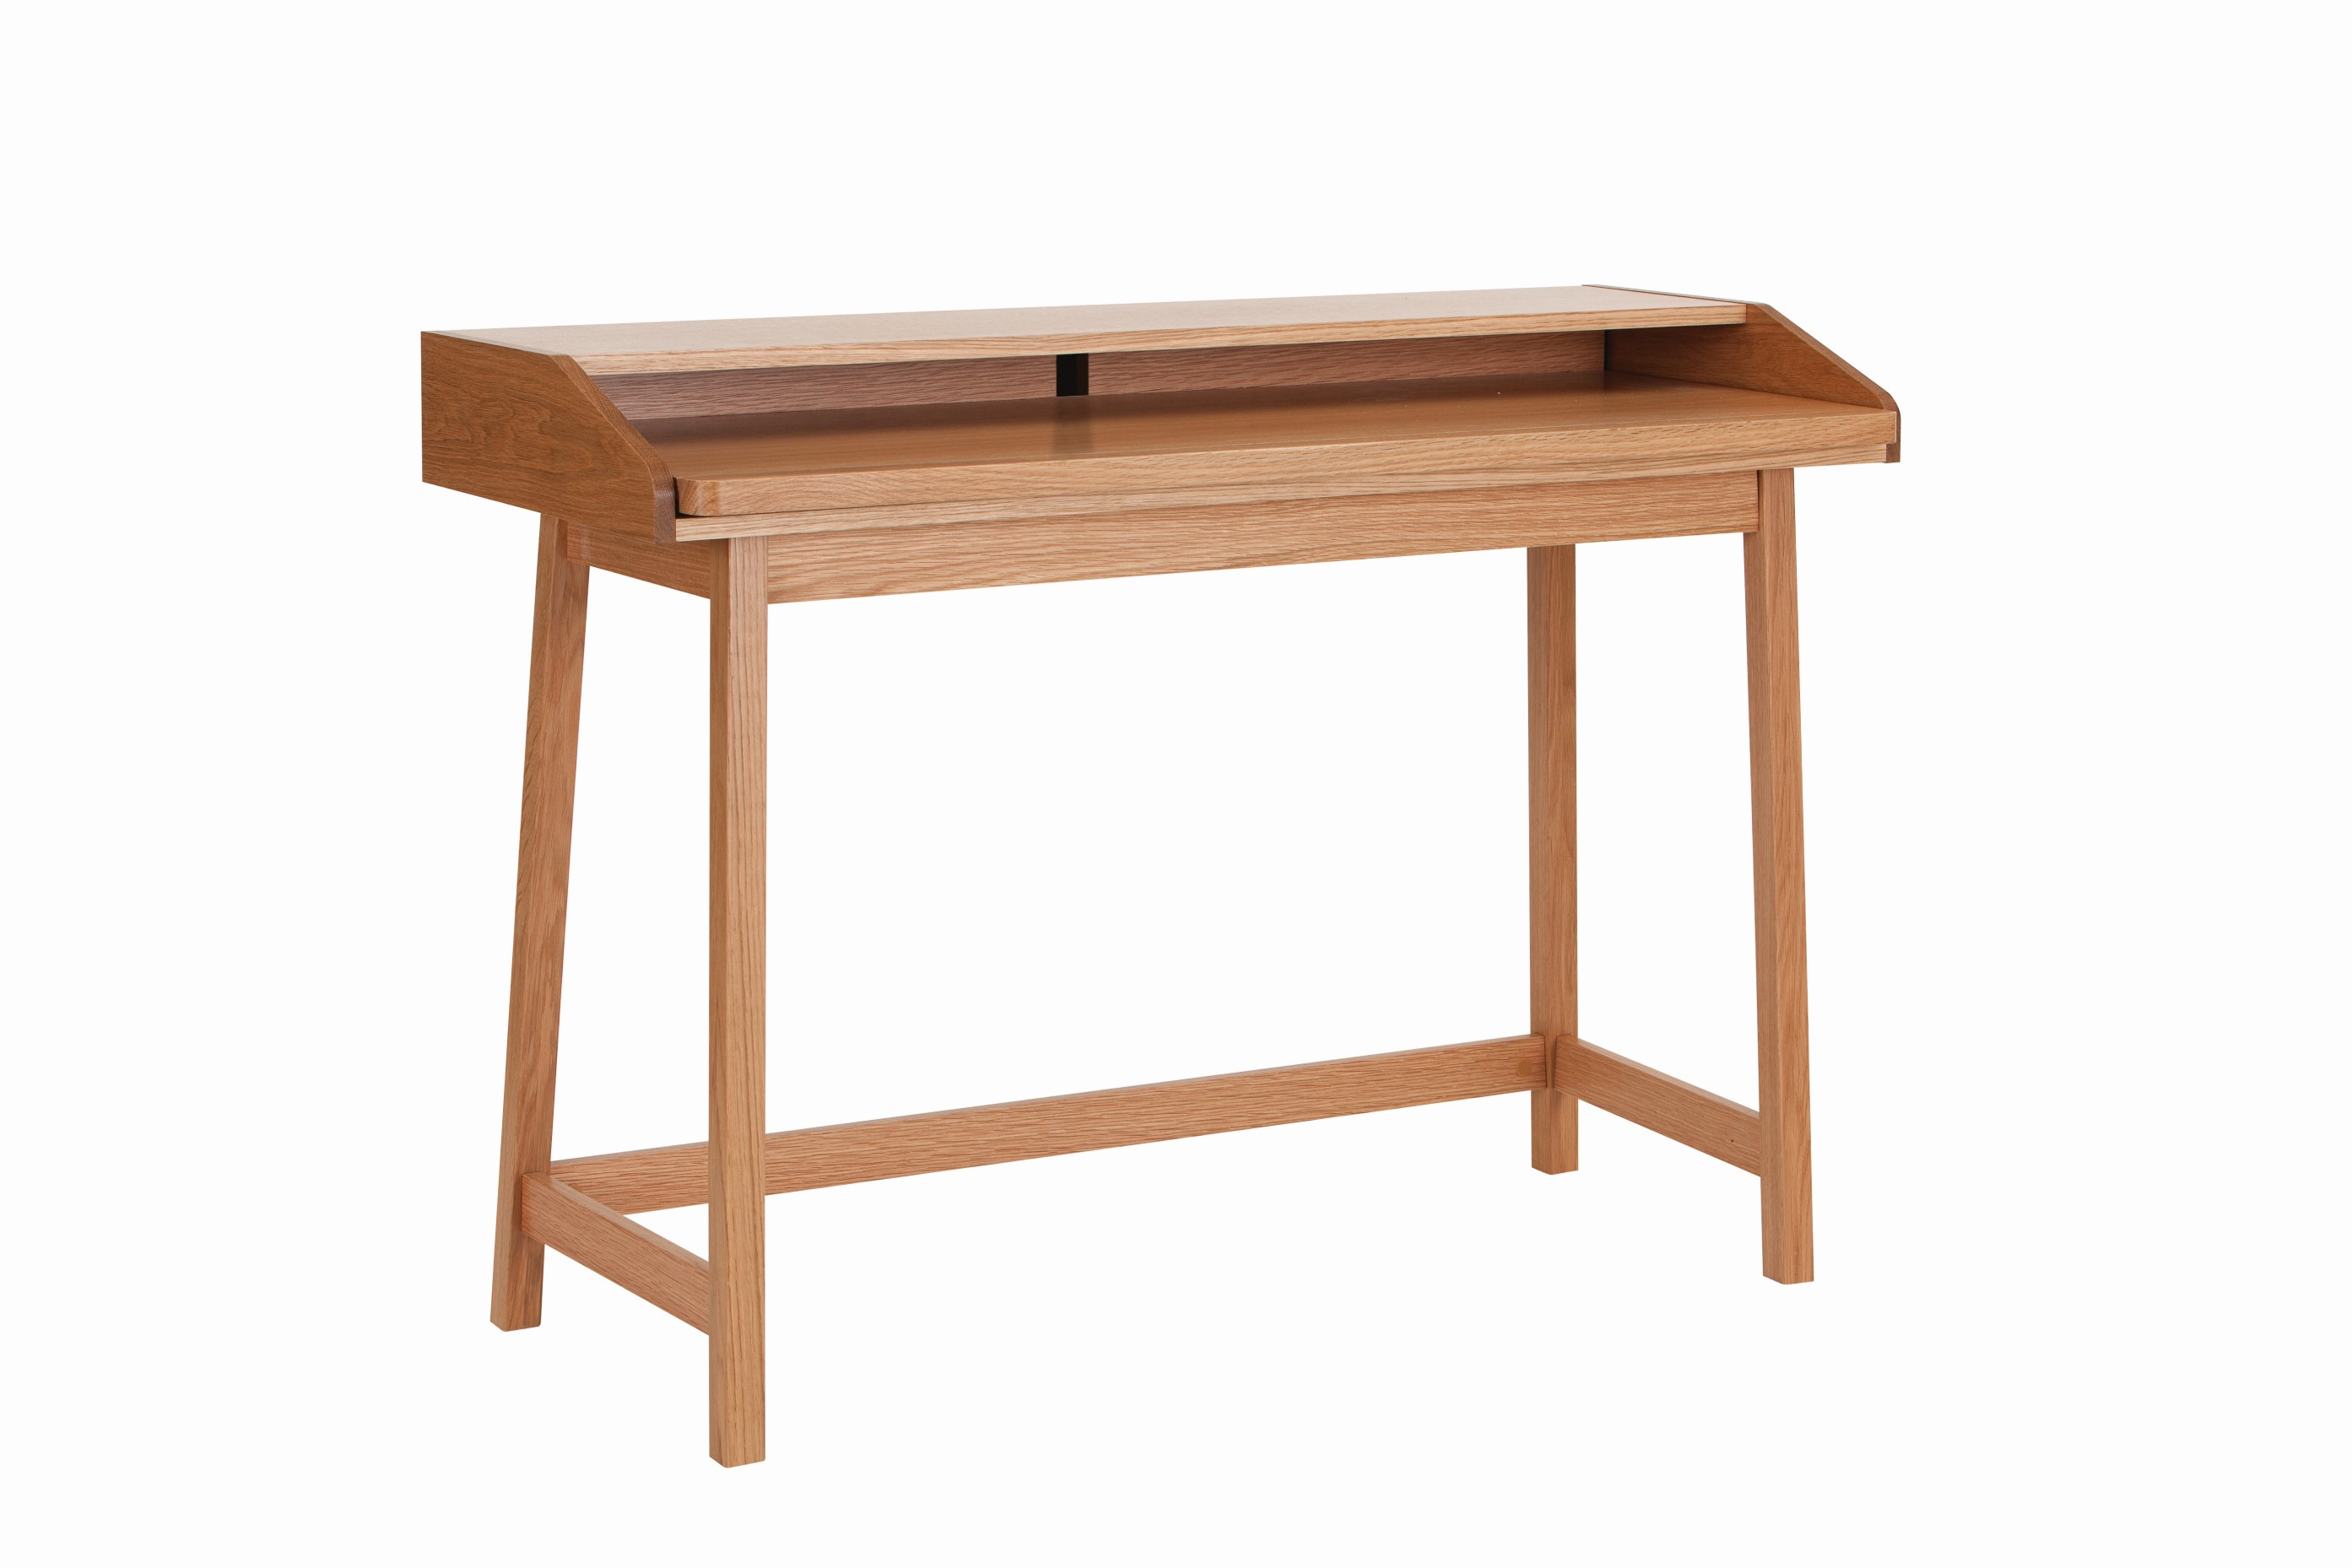 114001001014 St James Desk Oak 01